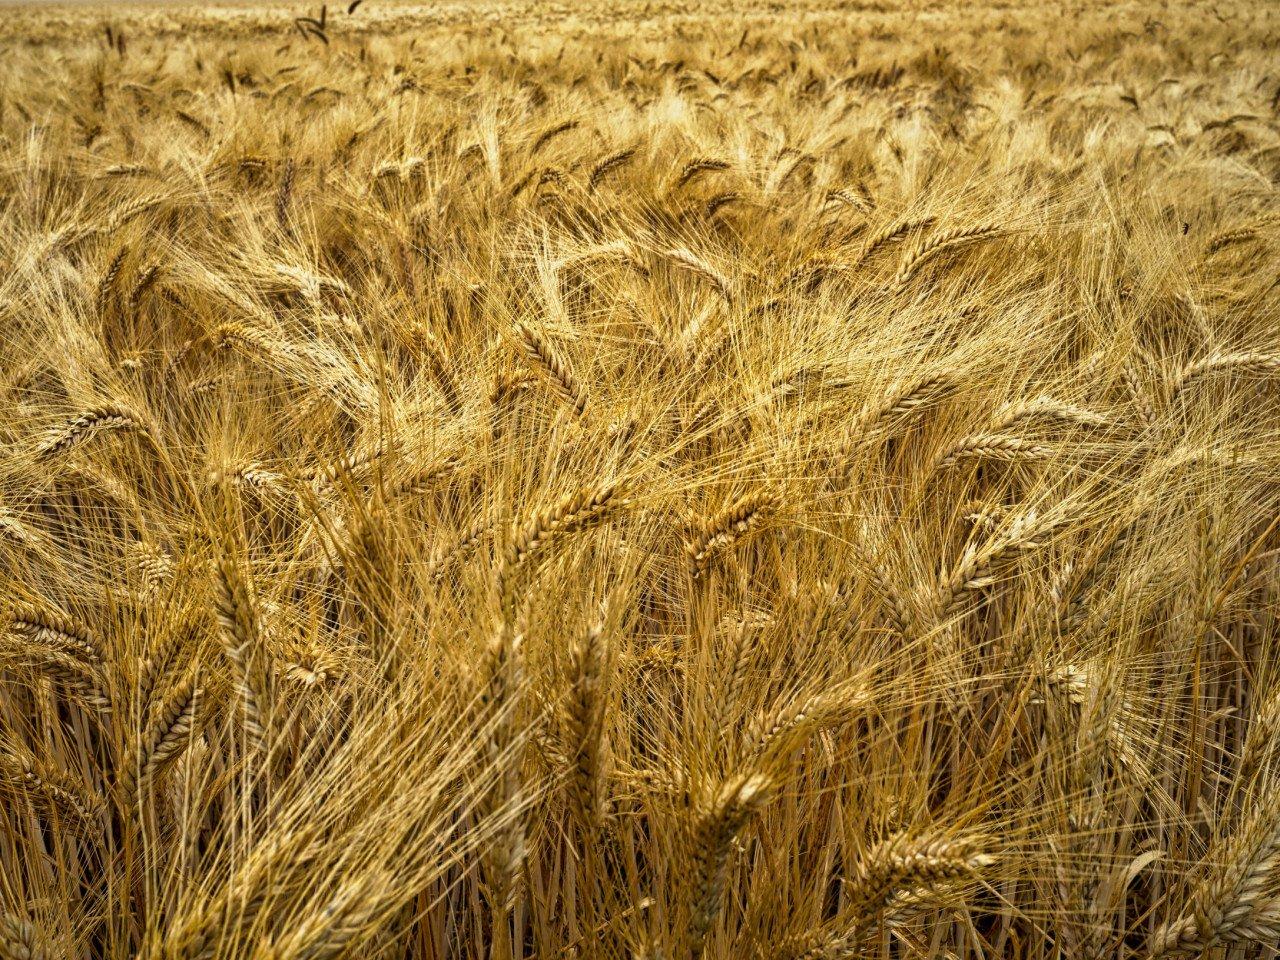 Озимая пшеница: характеристика, посев, уборка и хранение ...